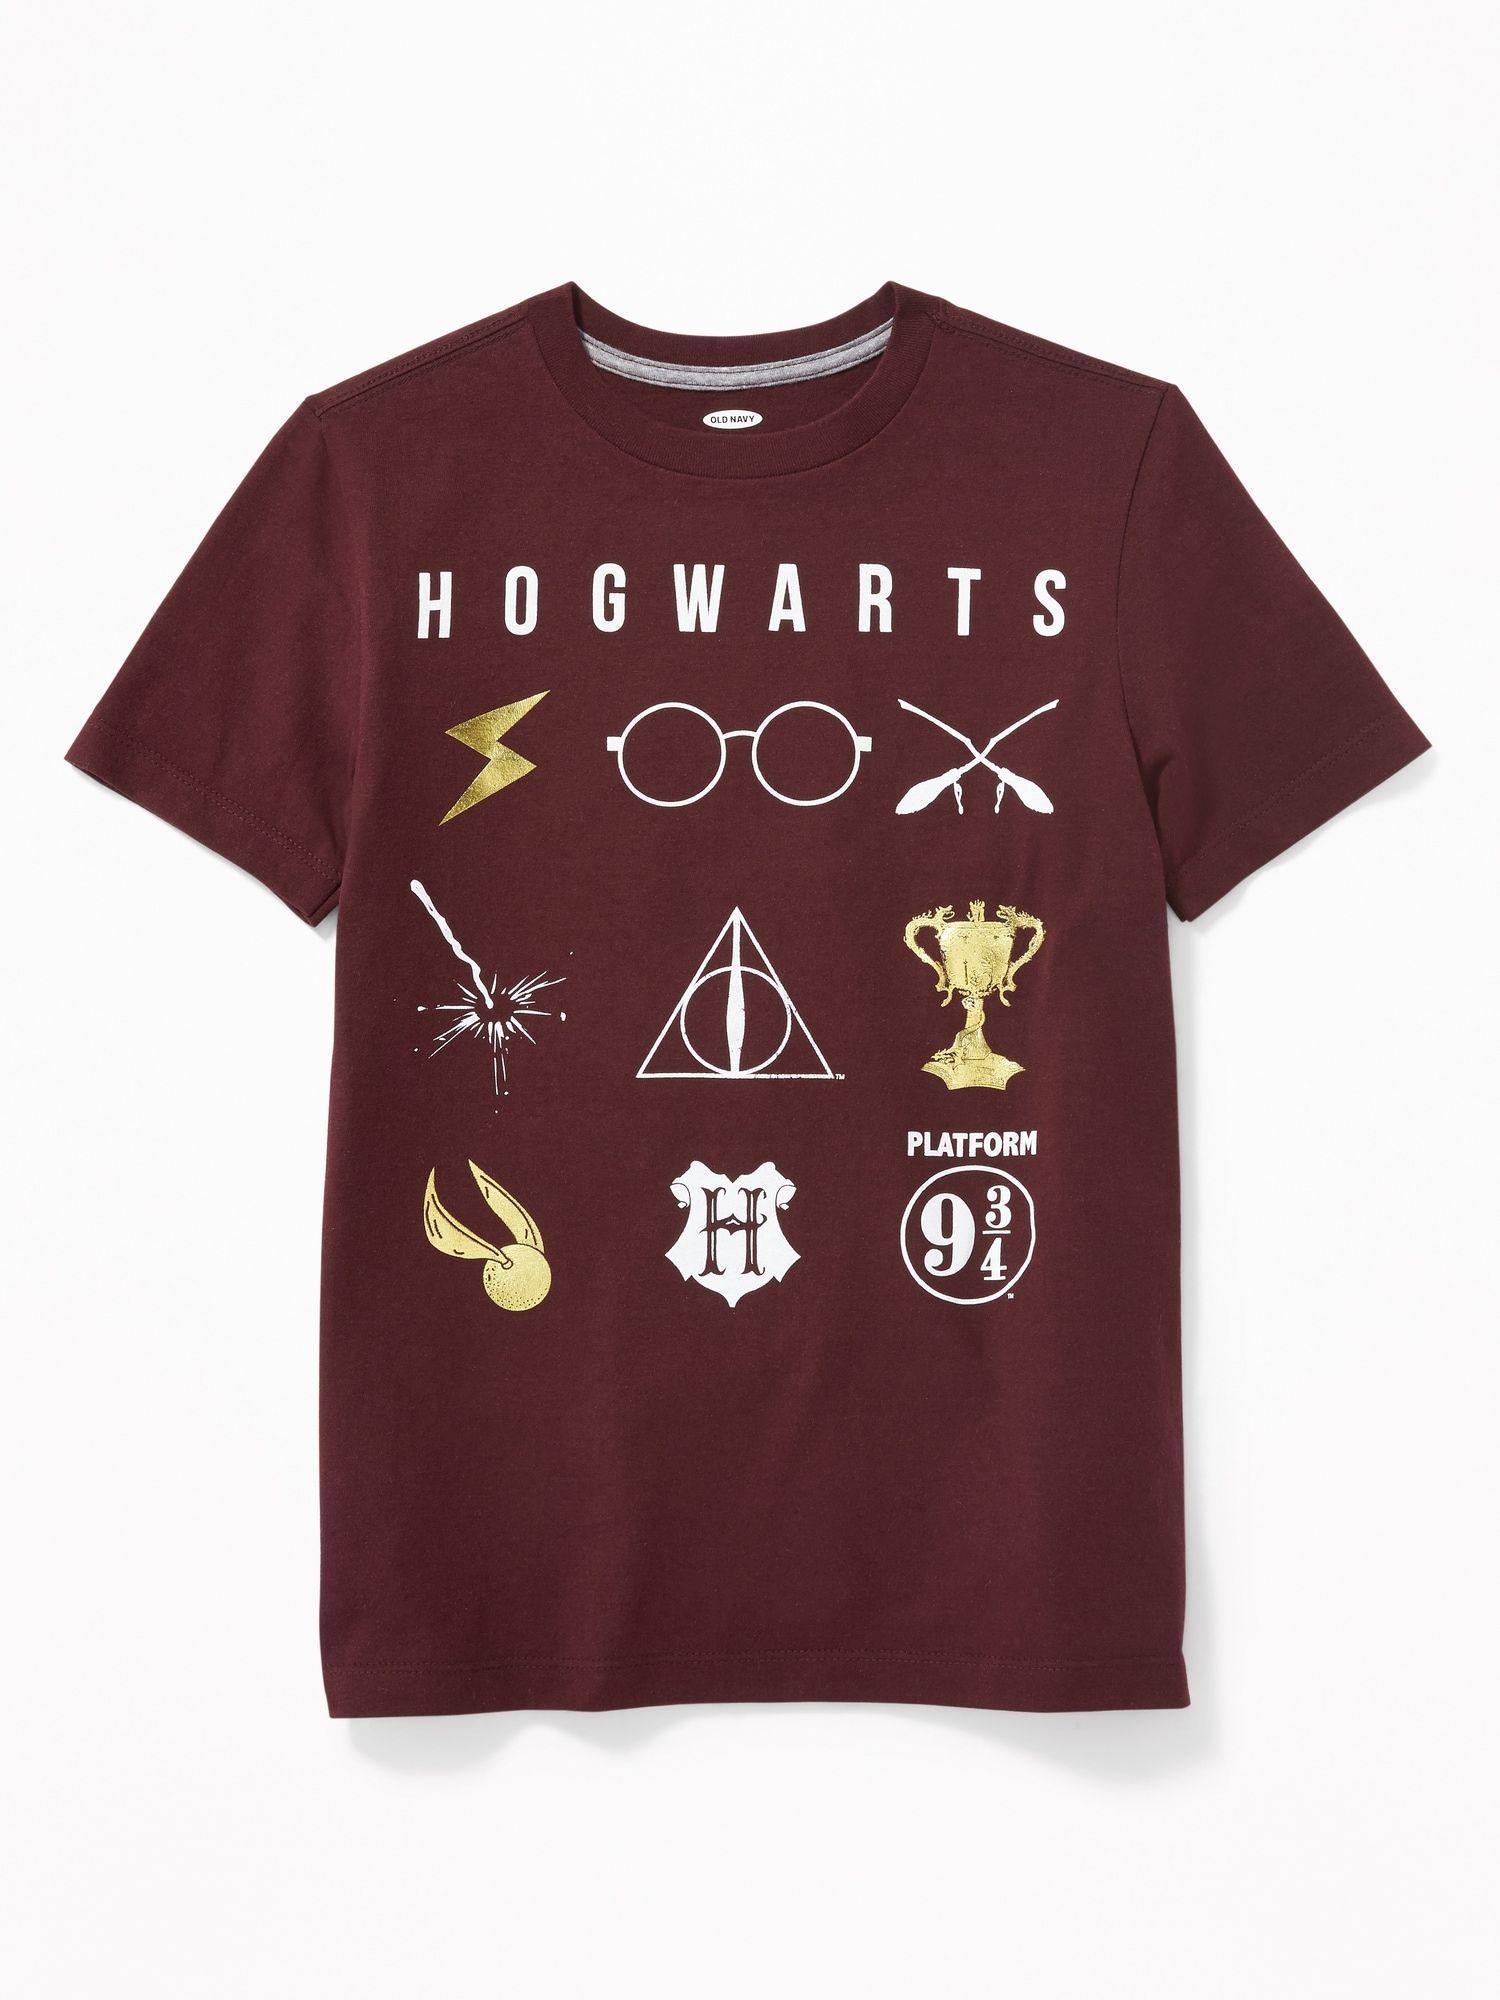 Official Merchandise Harry Potter Icons Boys Crewneck Sweatshirt